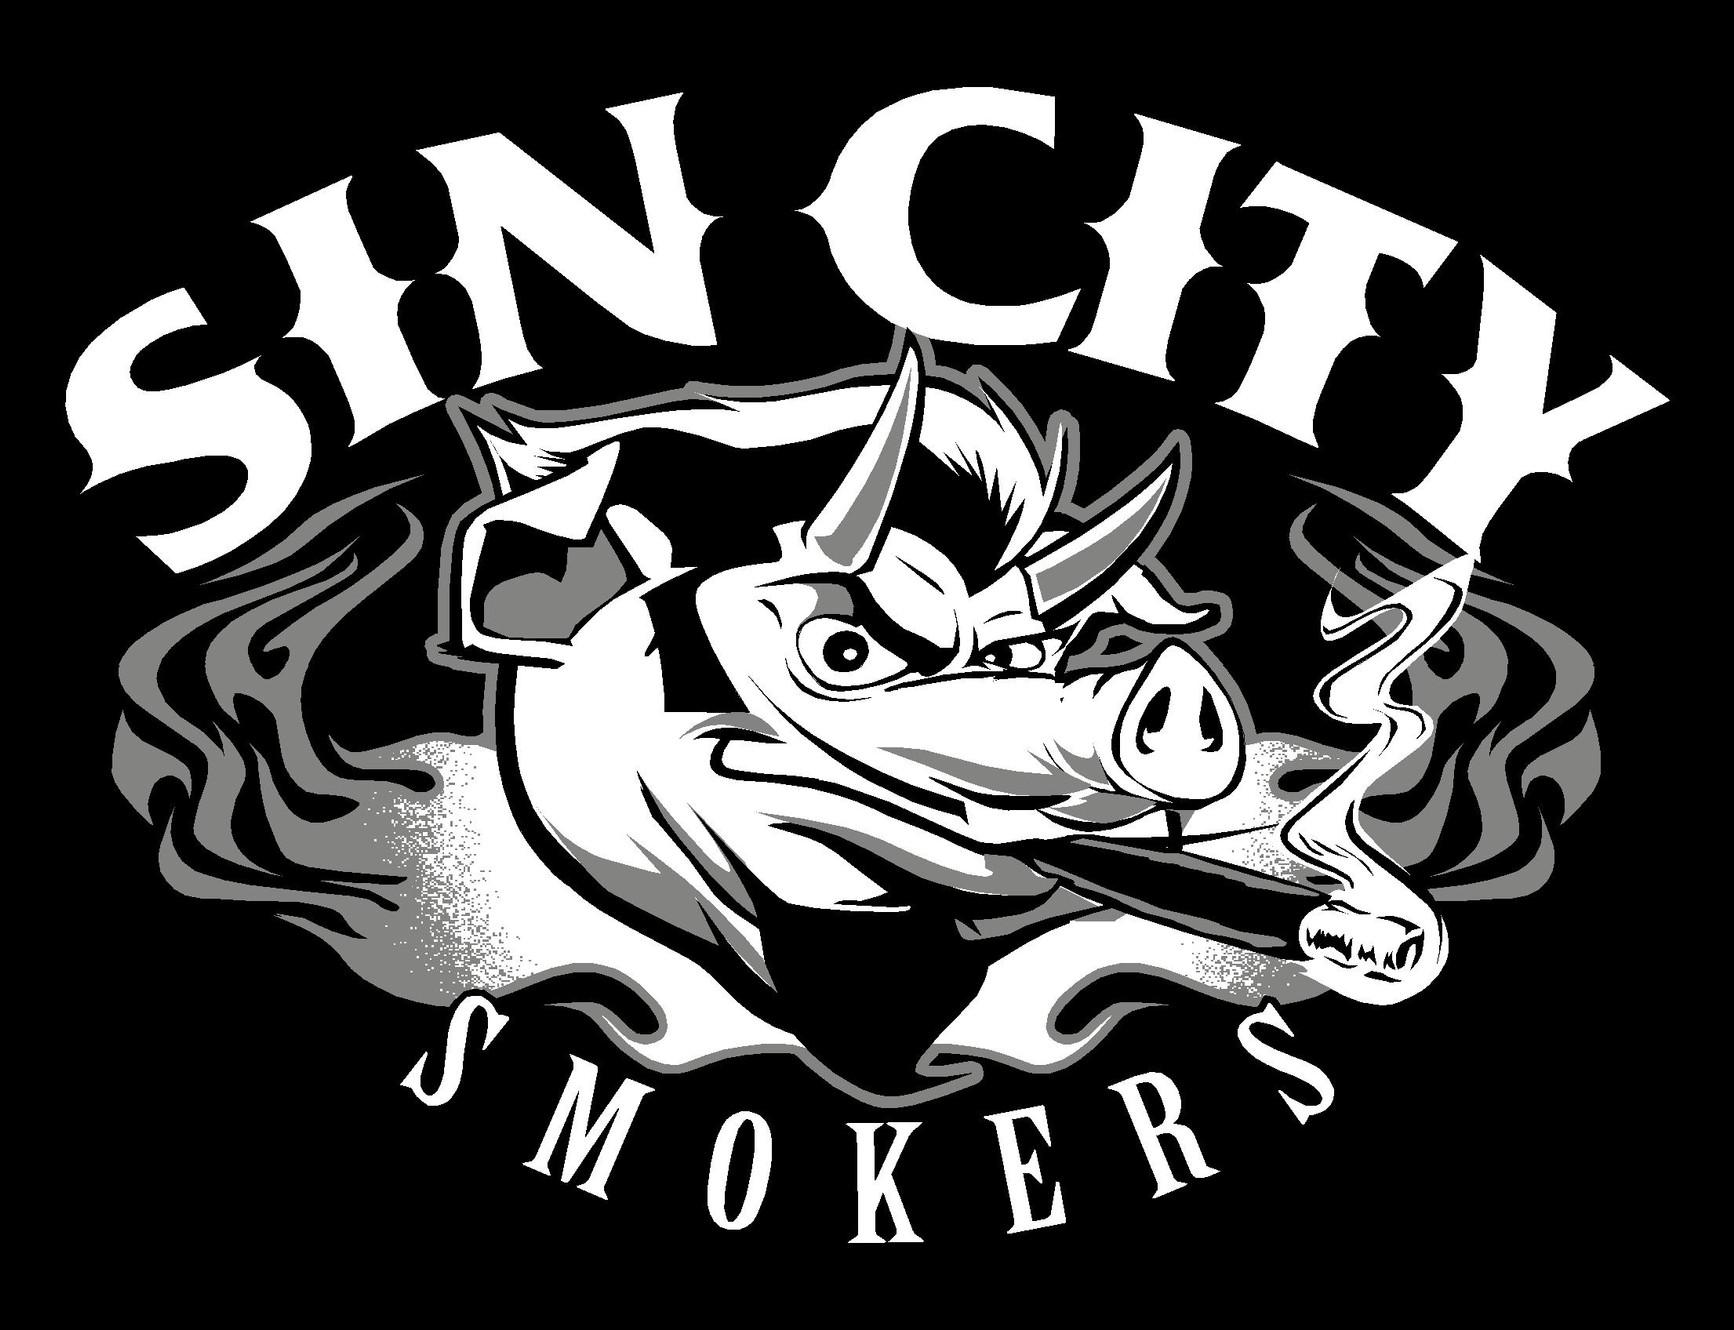 www.sincitysmokers.com